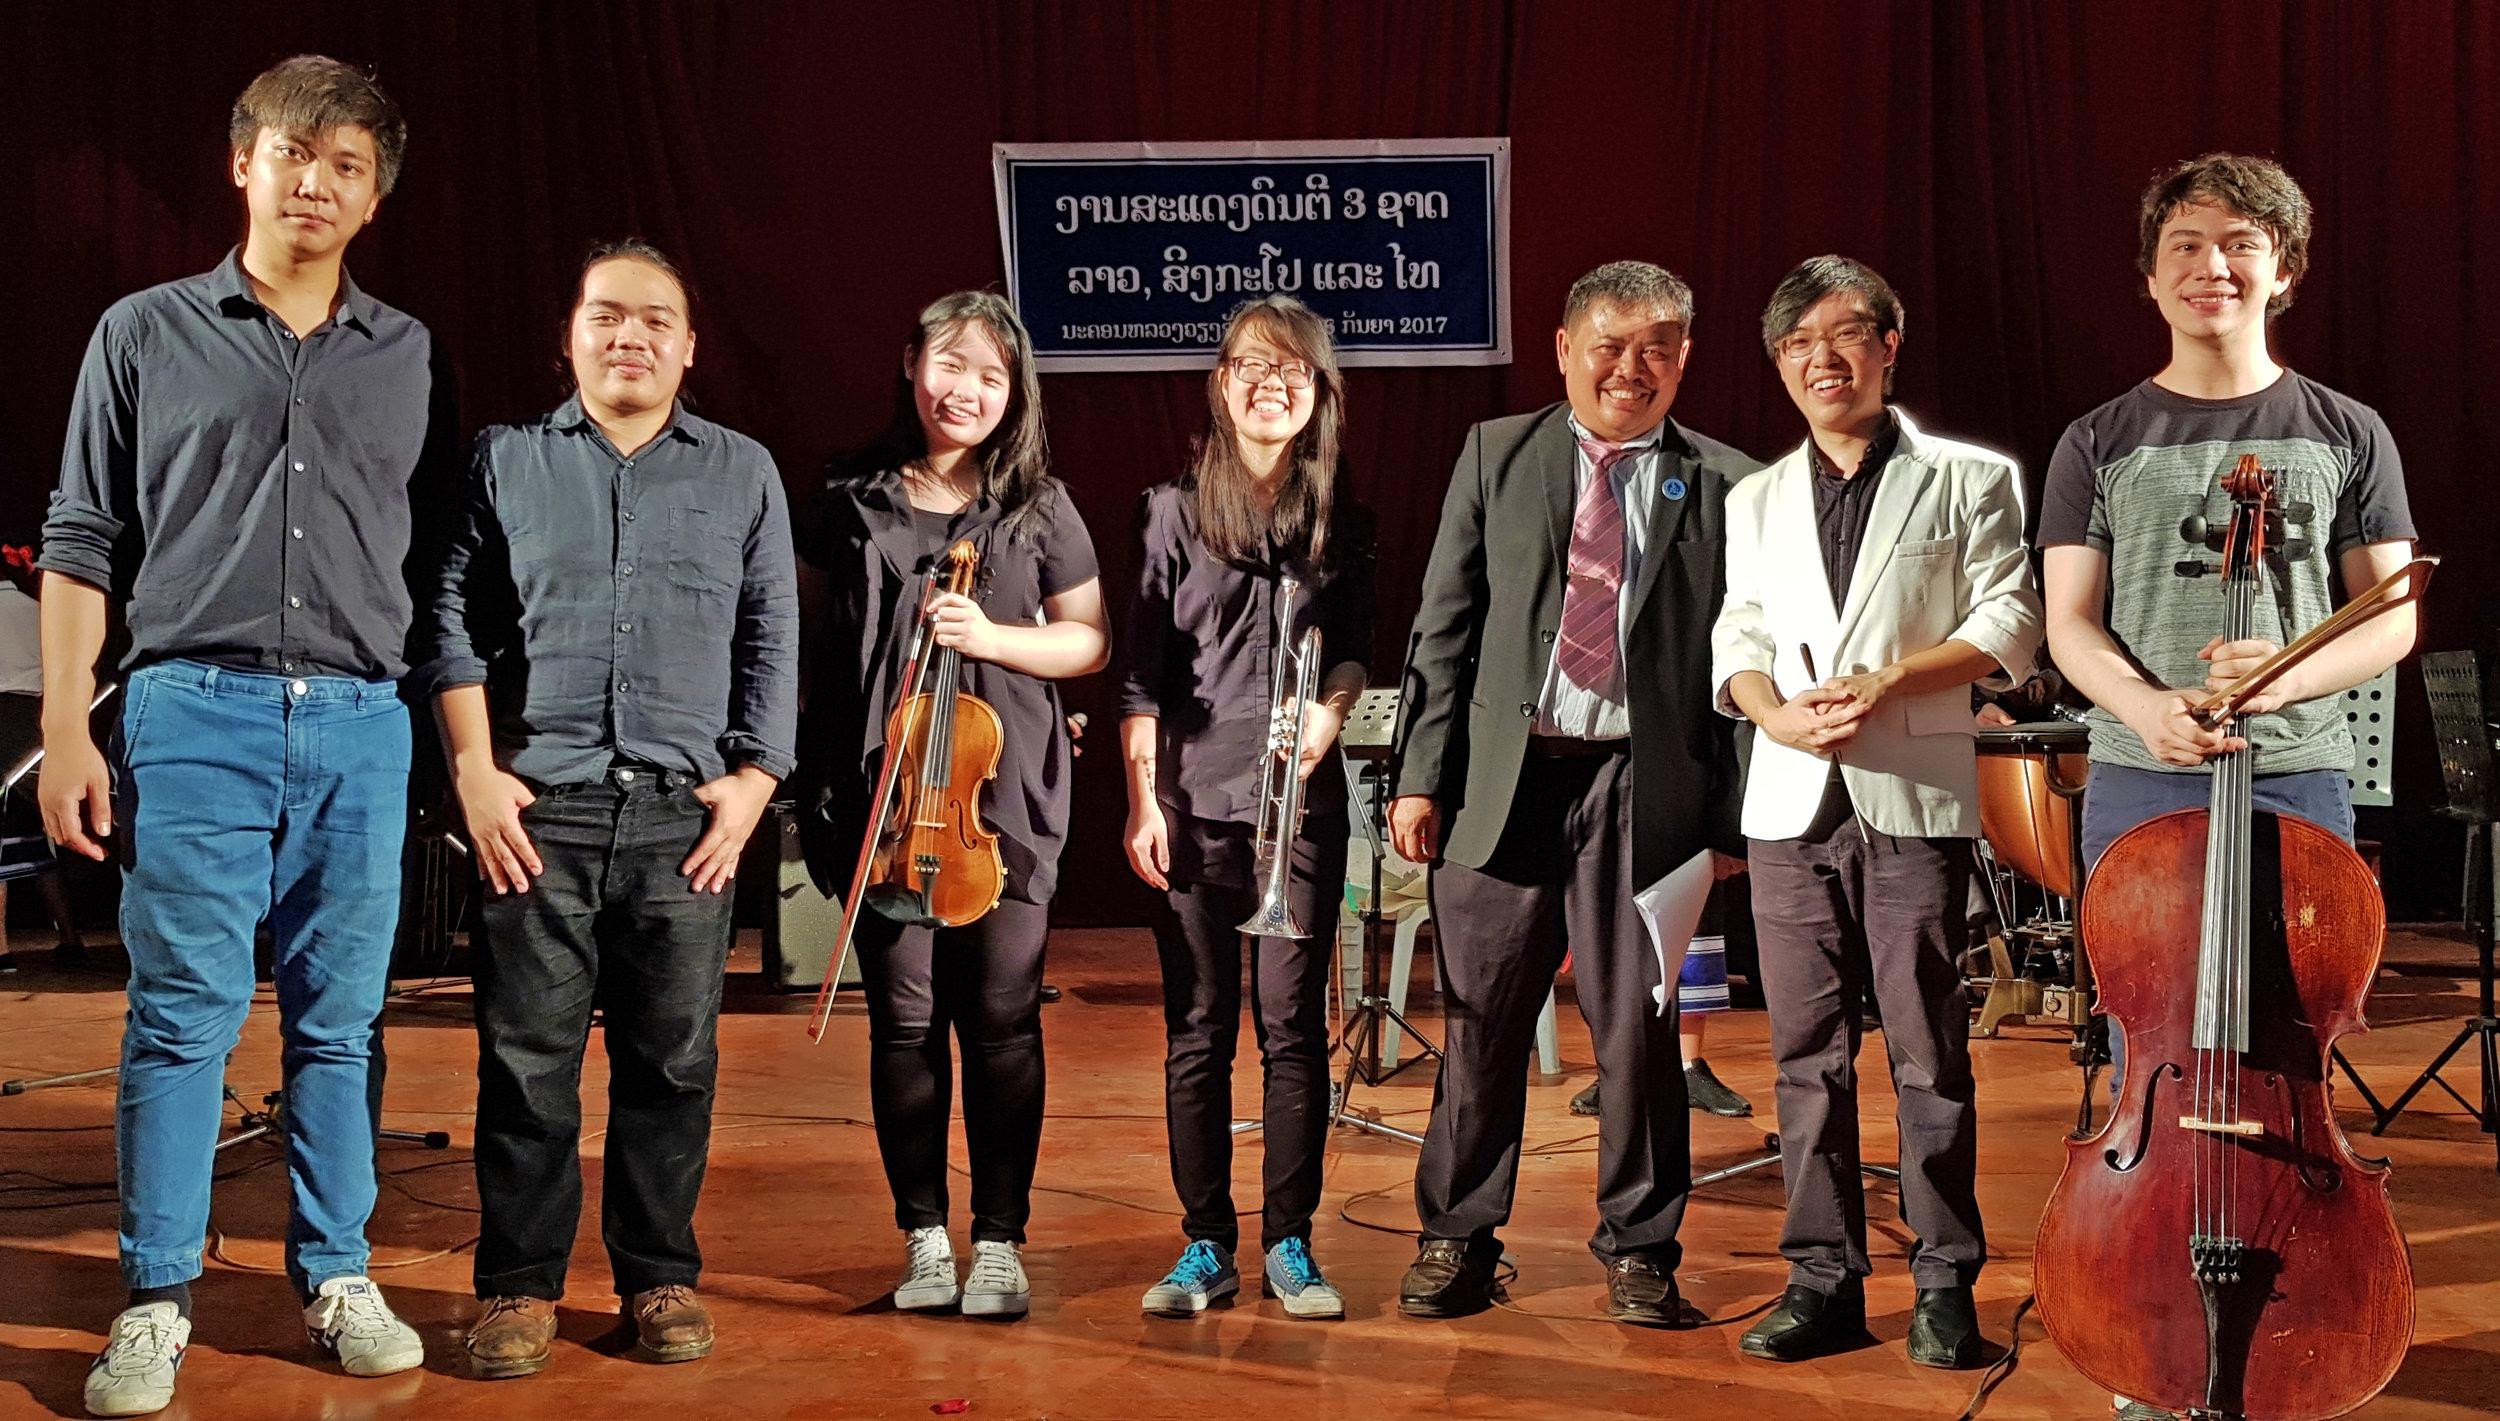 From left: Jirajet Thawornsiri, Chaiyaphat Prempree, Ho Qian Hui, Lee Jia Yi, Mr Saveng (Co-ordinator from NLDMS), Sulwyn Lok and Noah Diggs